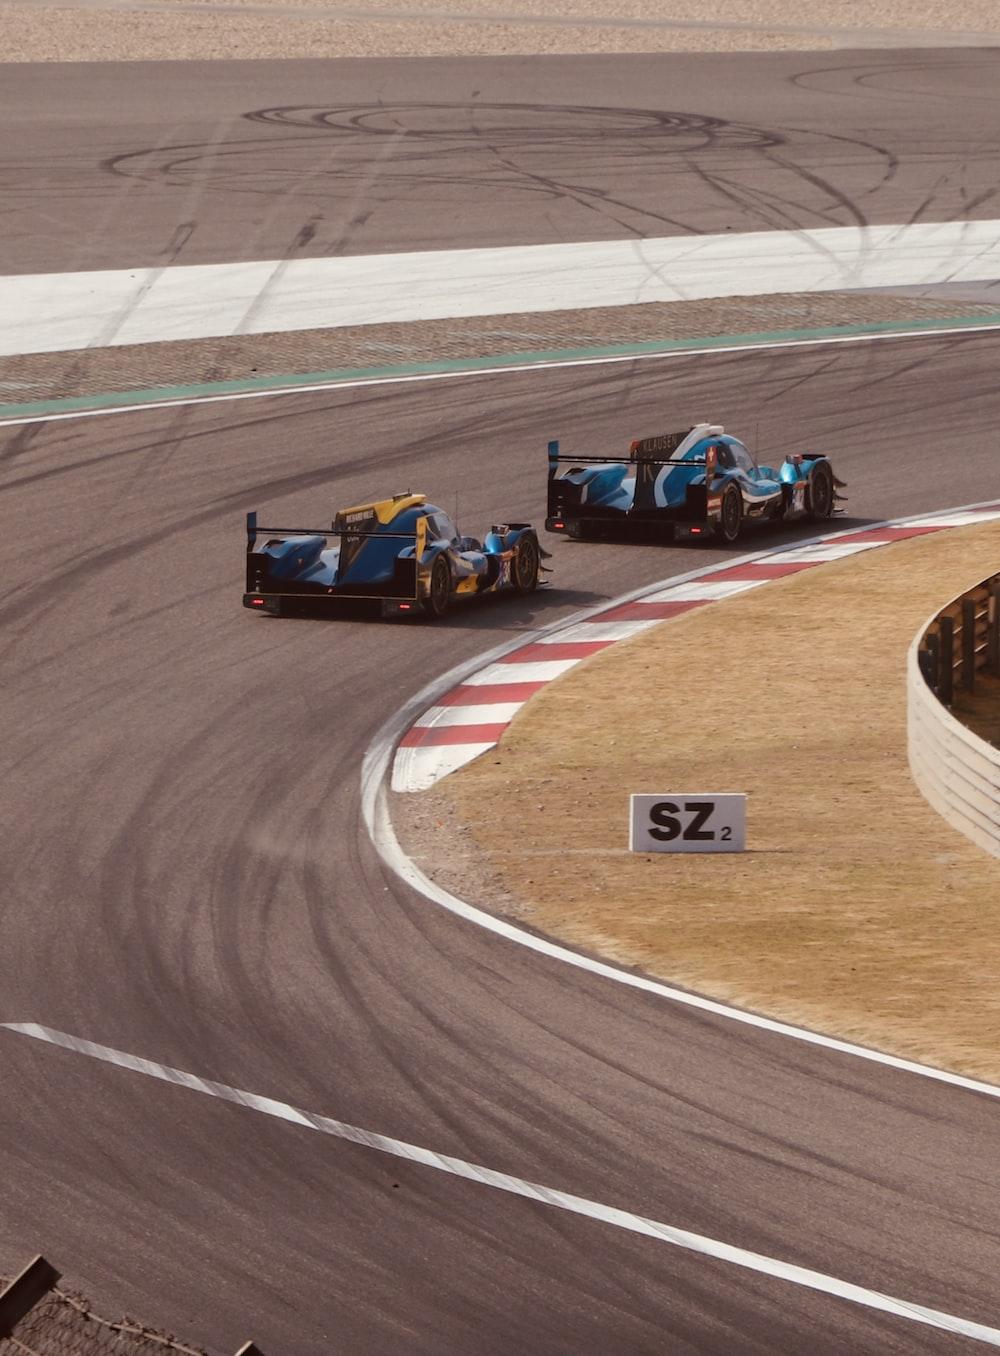 formula 1 on race